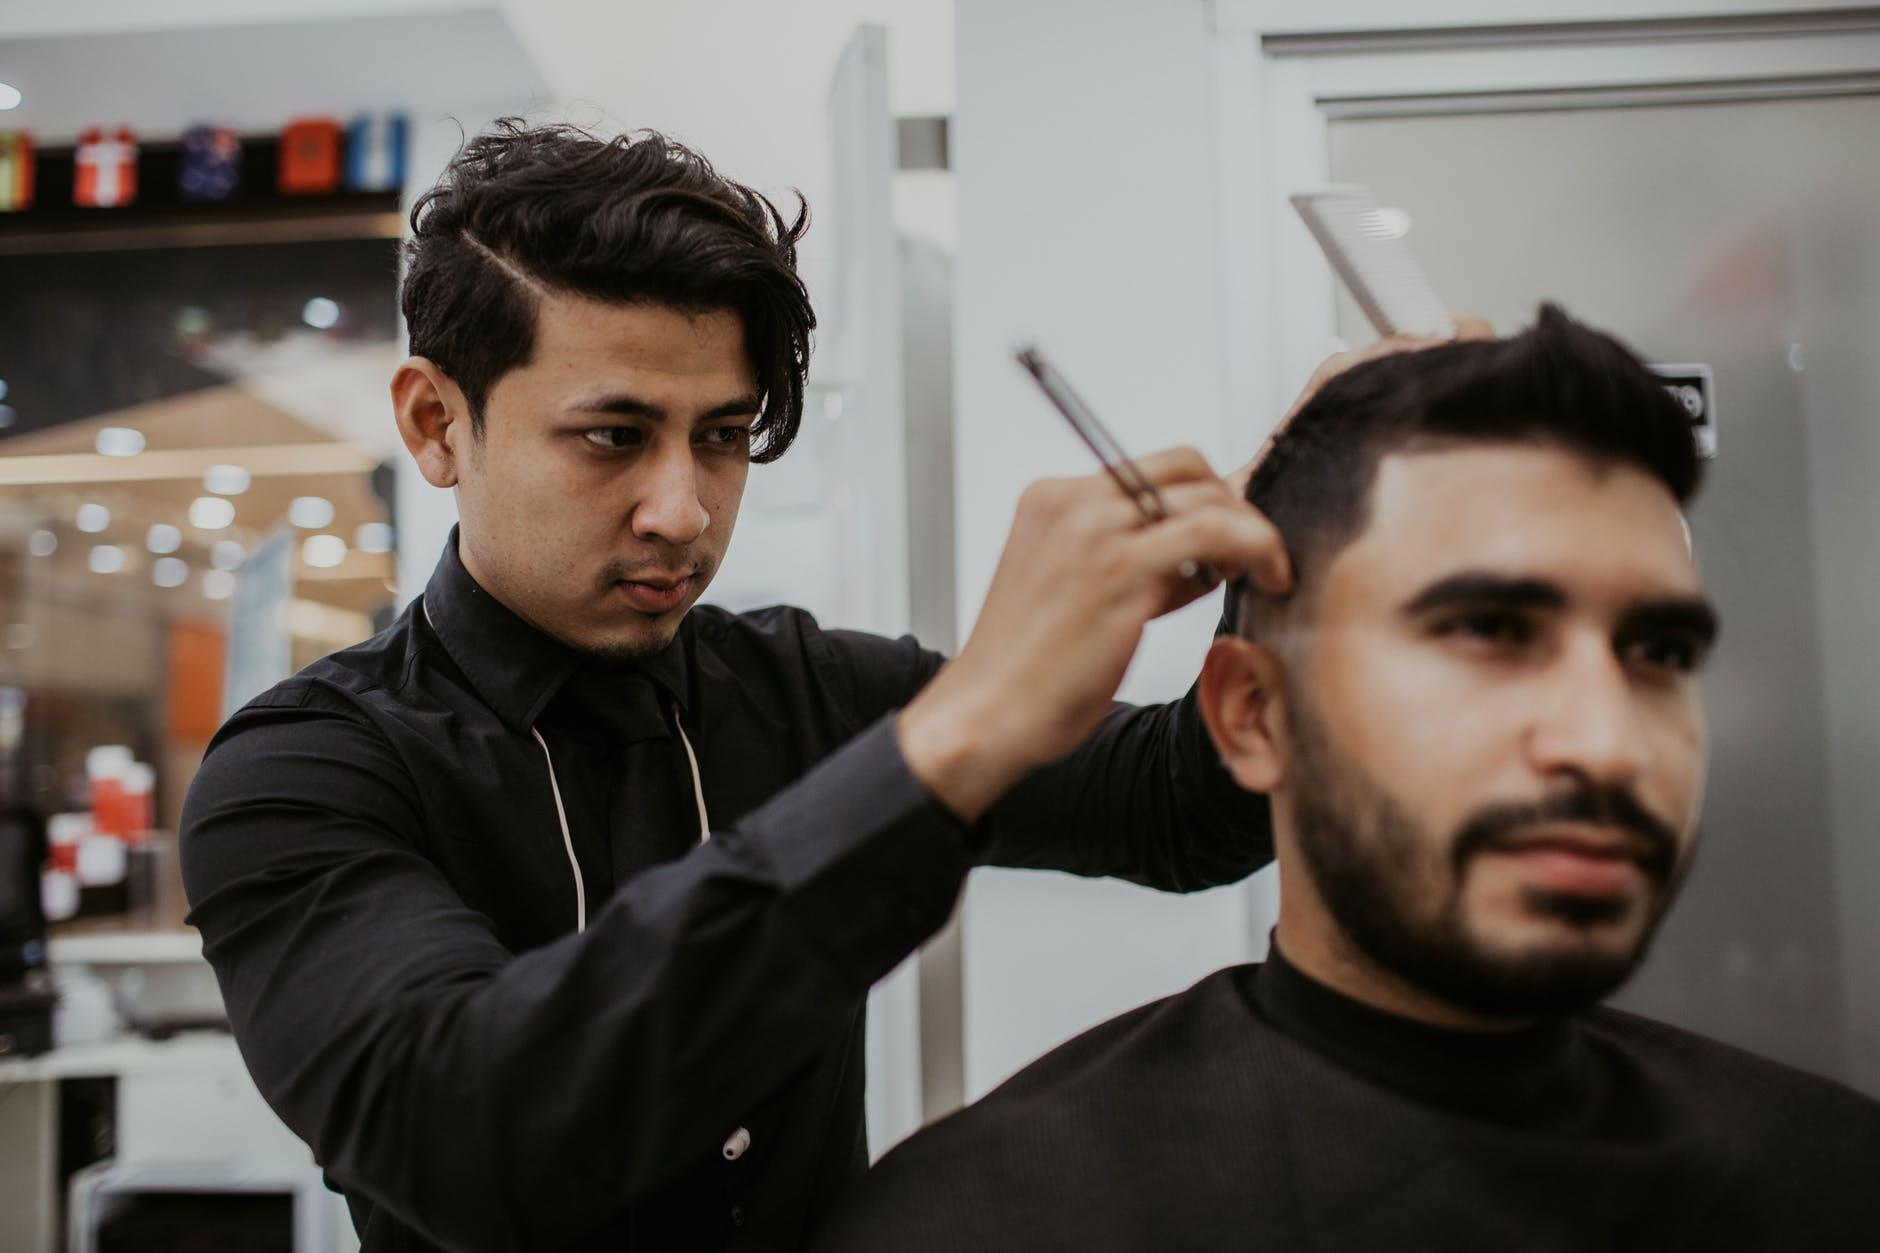 man cutting another man s hair